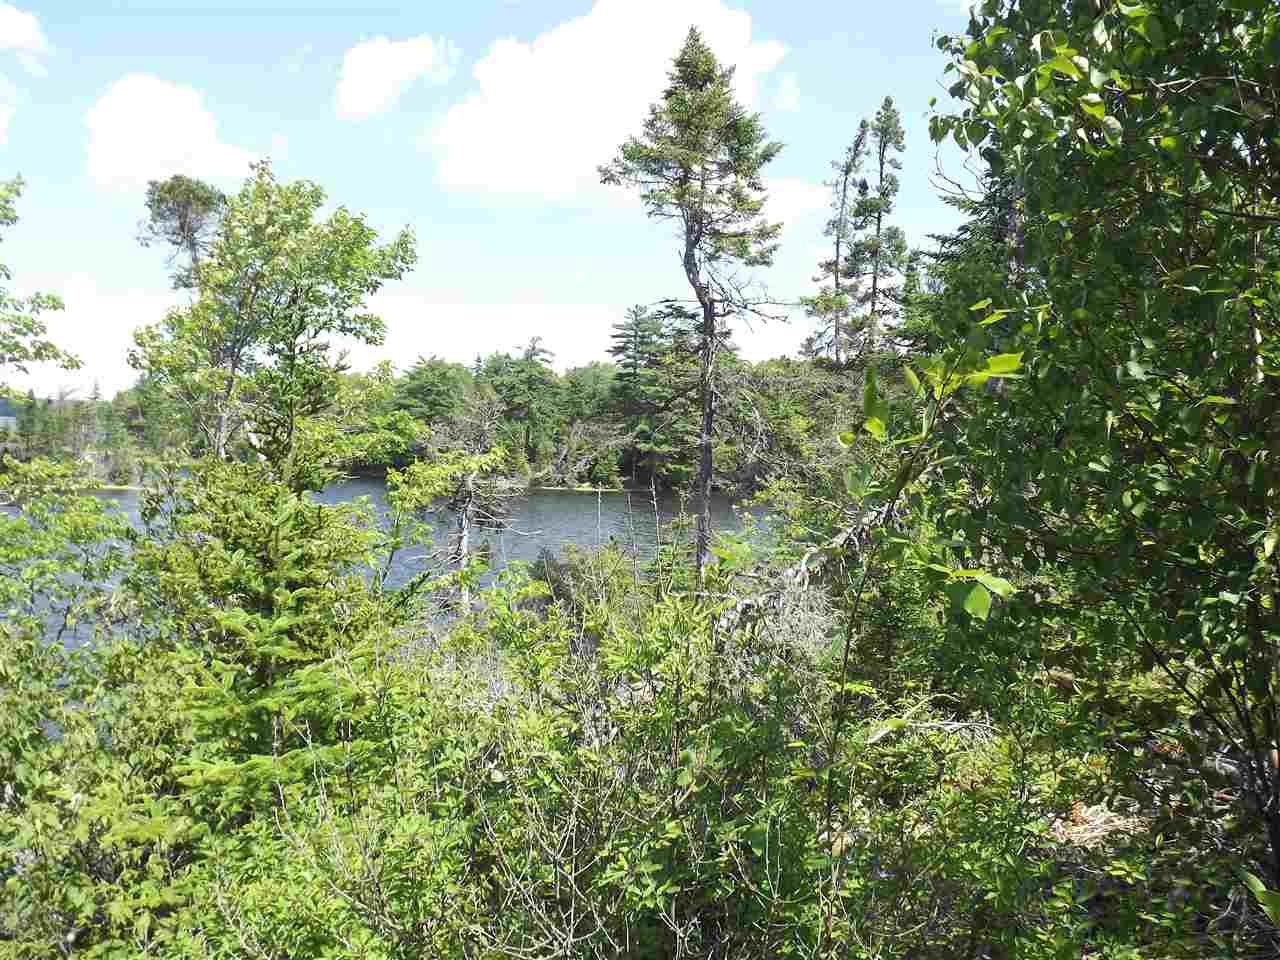 Photo 4: Photos: Trout Brook Road in Albert Bridge: 210-Marion Bridge Vacant Land for sale (Cape Breton)  : MLS®# 201919549